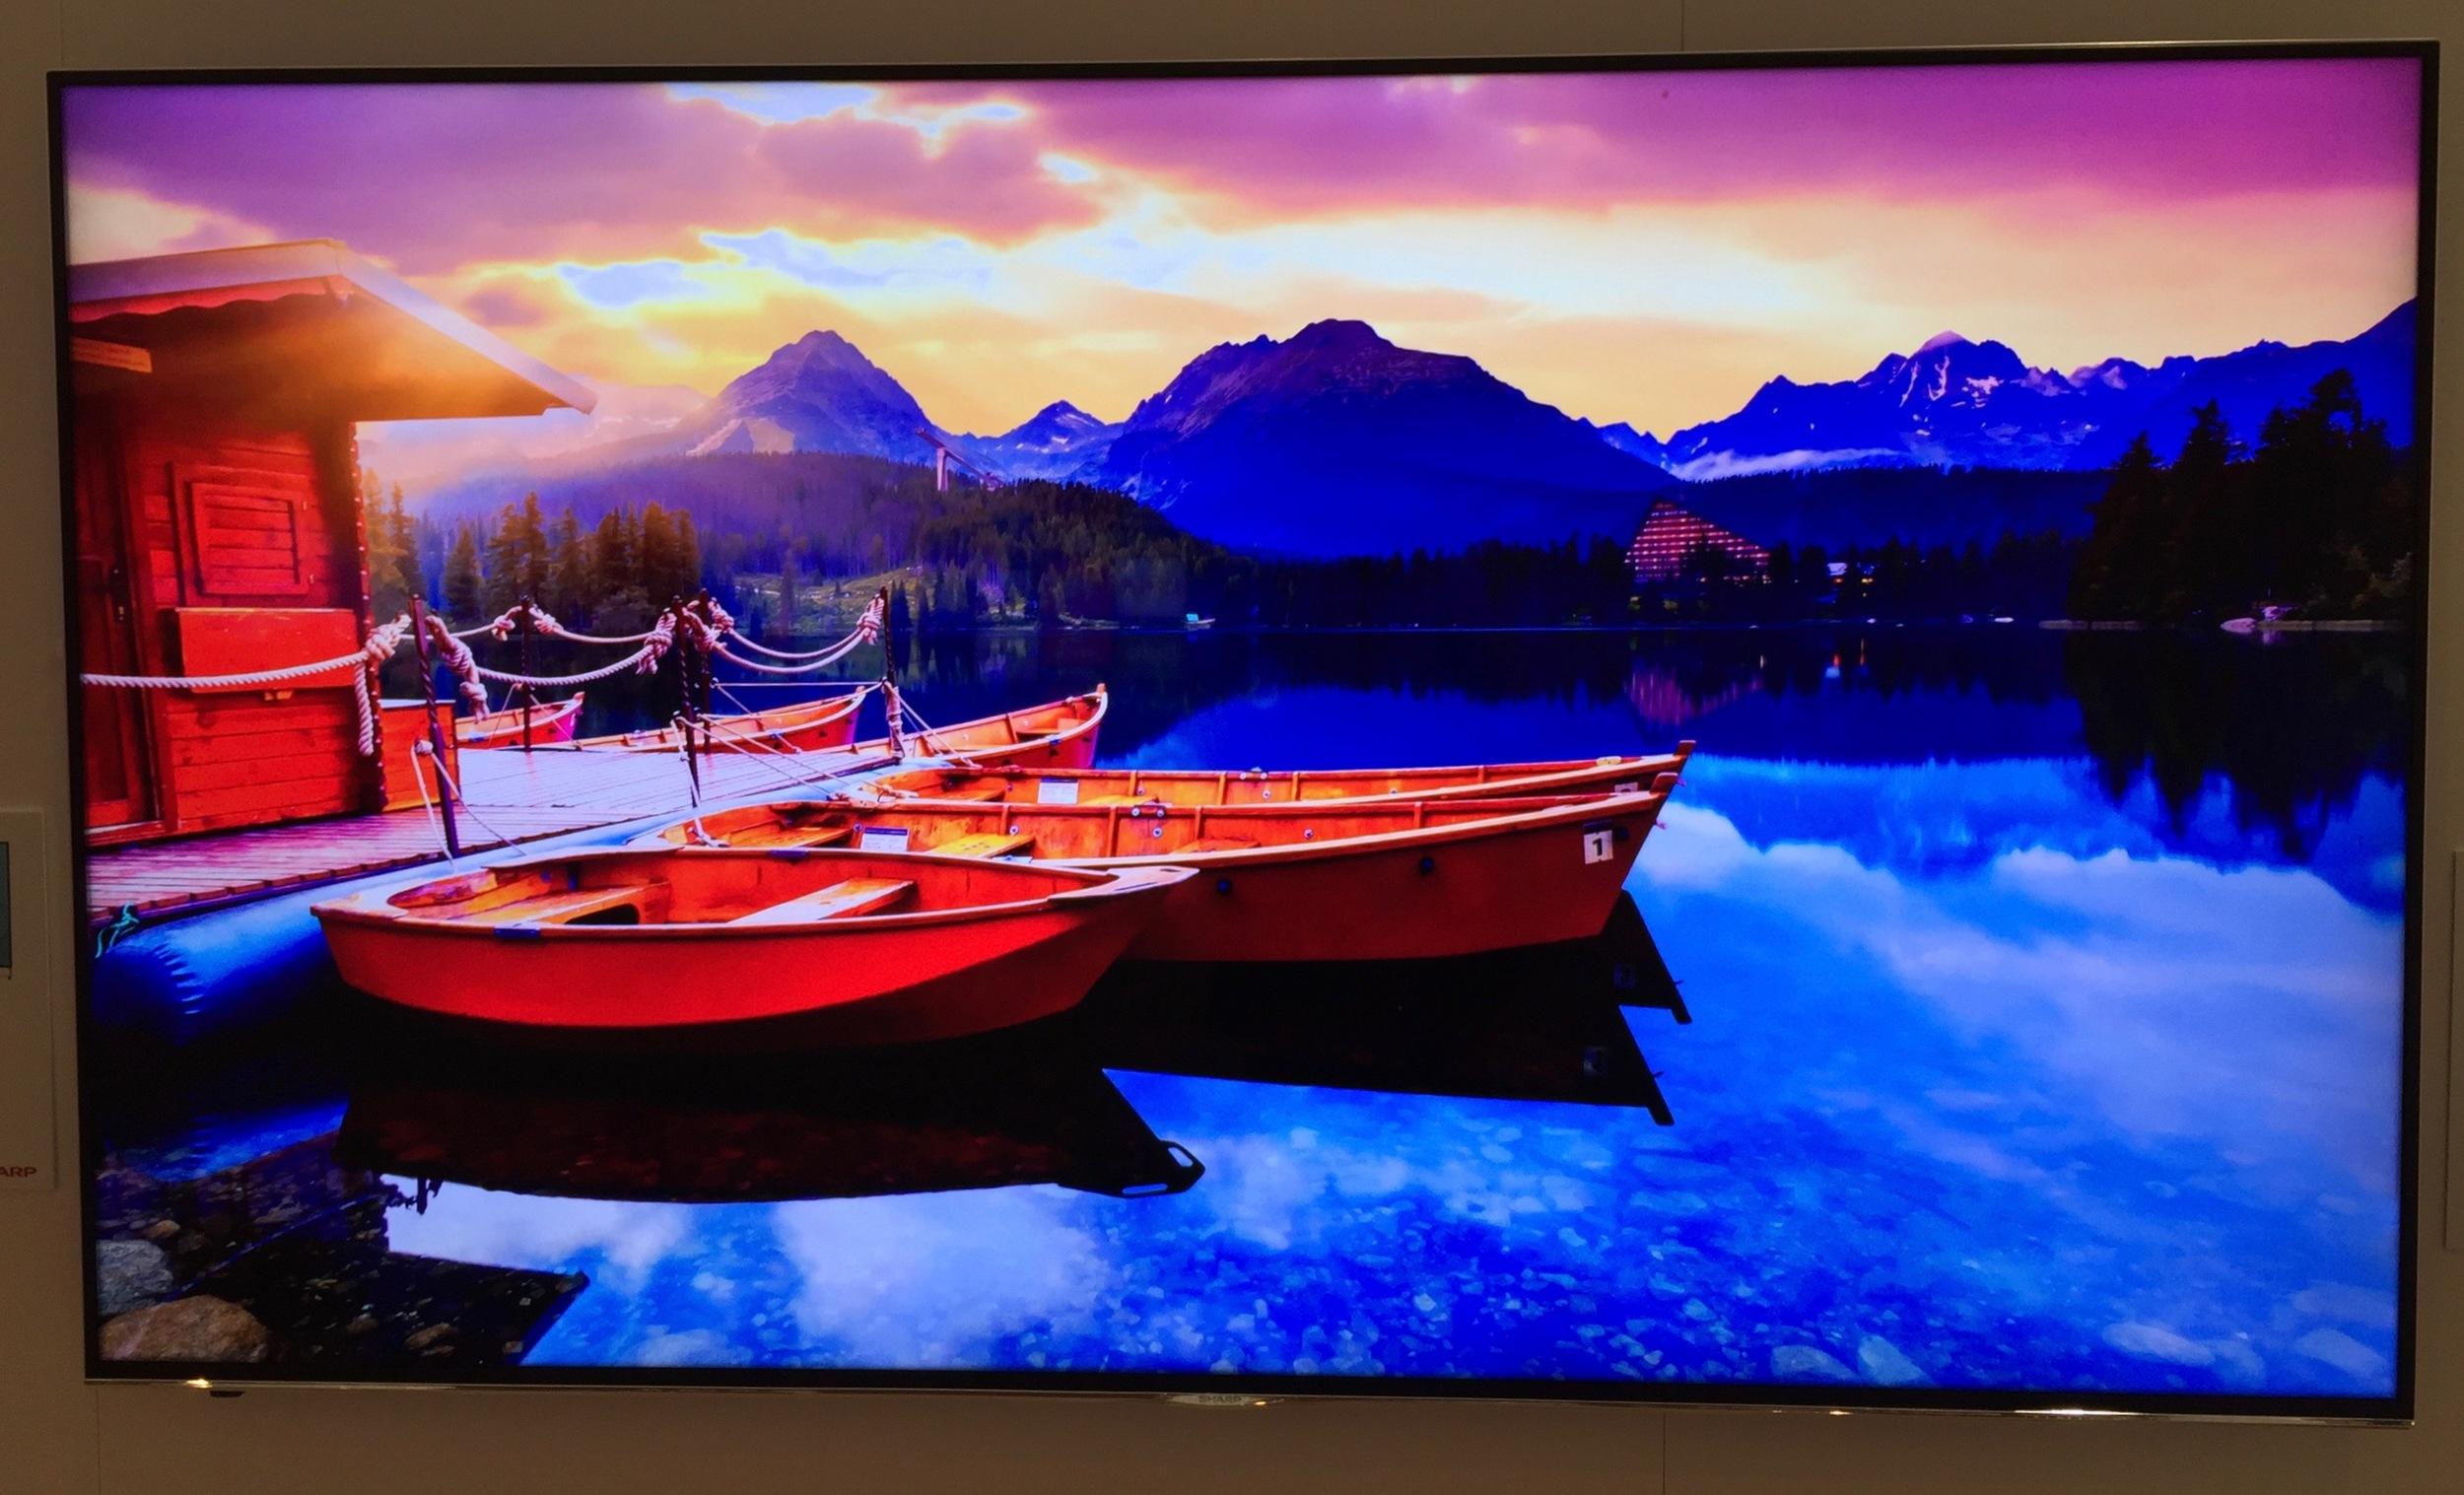 Sharp N9000 QuantuM Dot TV at CES 2016